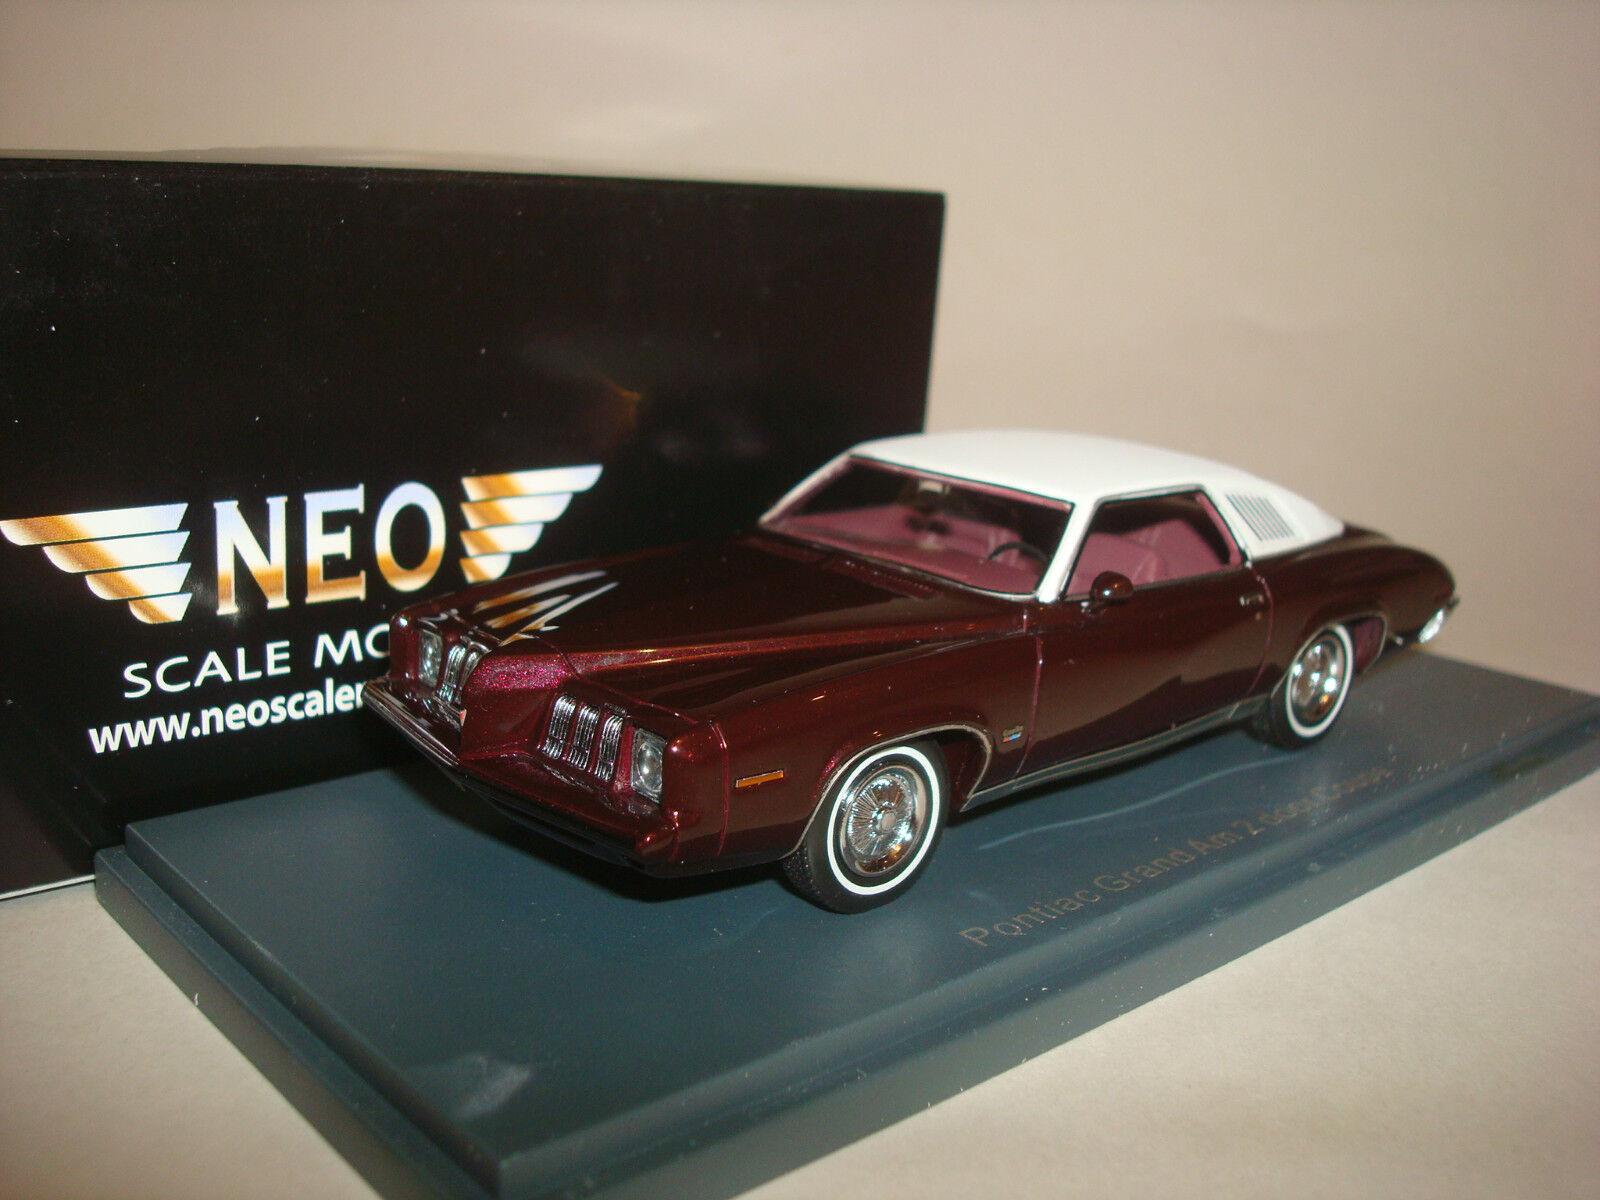 precio razonable Pontiac Grand Am Coupe-Rojo Coupe-Rojo Coupe-Rojo gris se reunió 44755 Neo 1 43  venta mundialmente famosa en línea